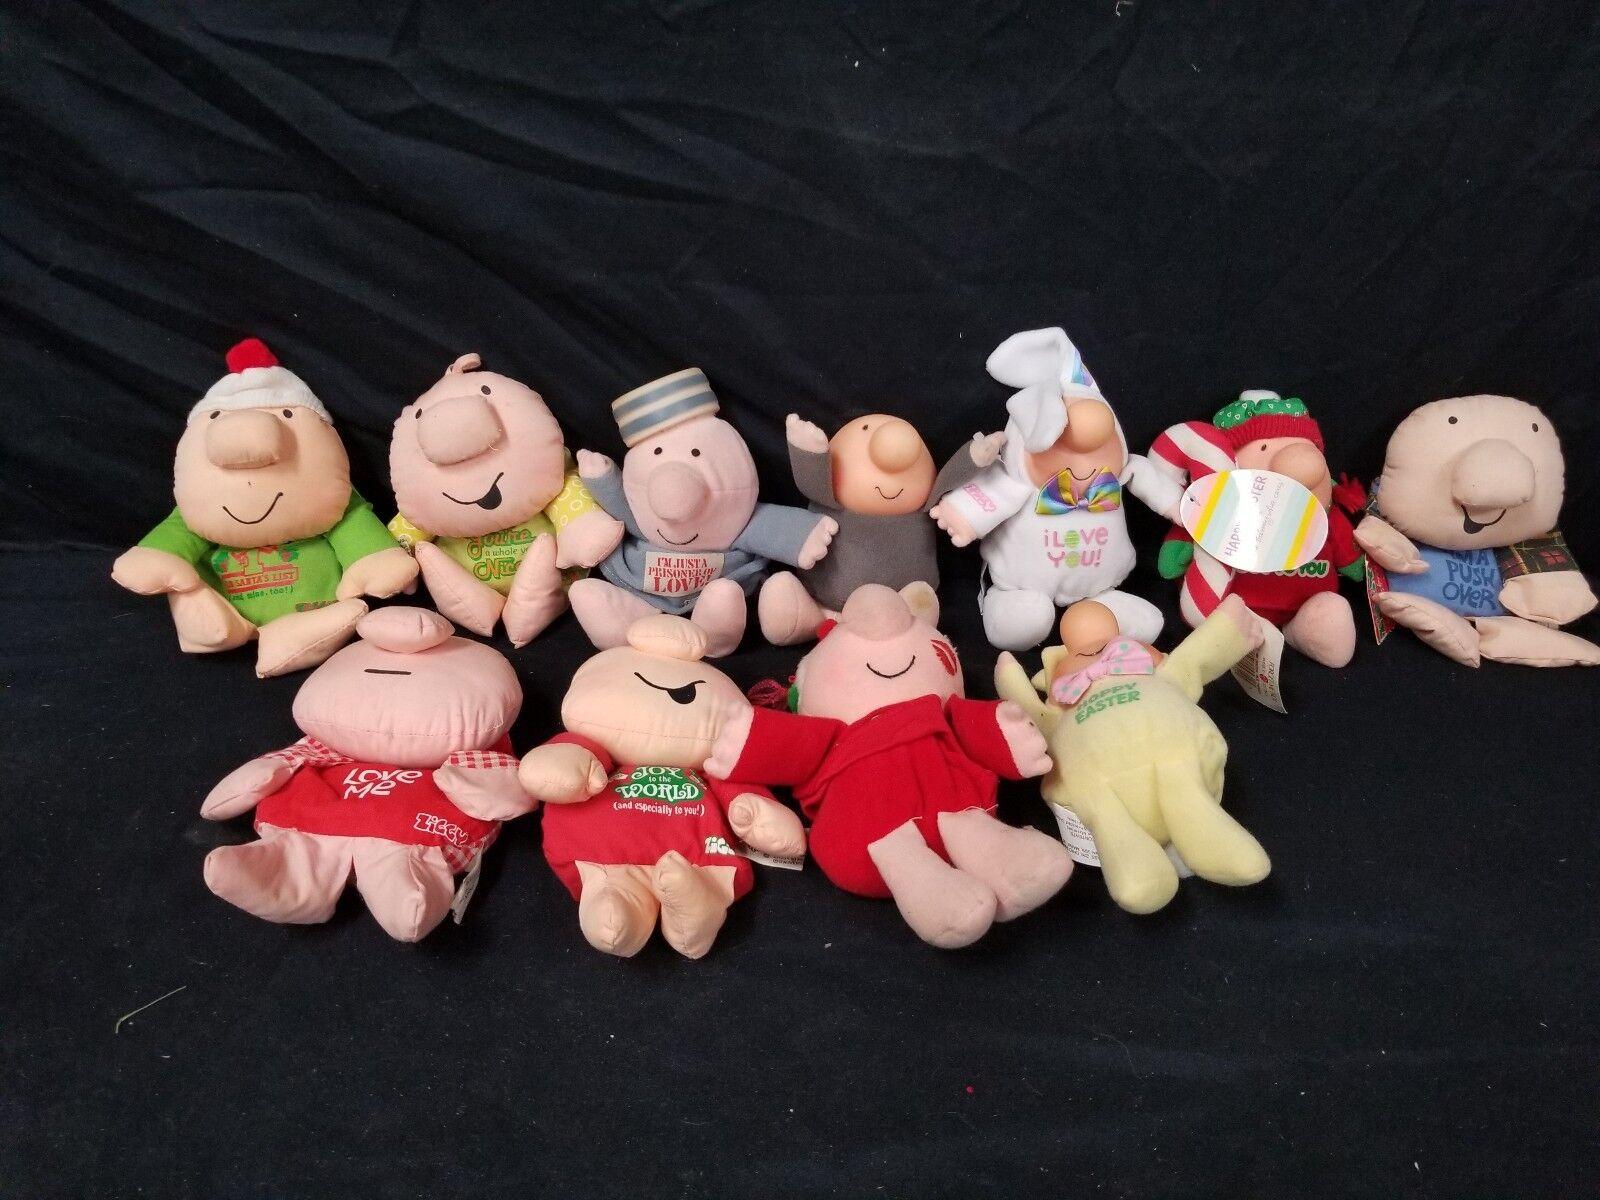 Lot of 11 11 11 Vintage Ziggy Stuffed Animals 79304c